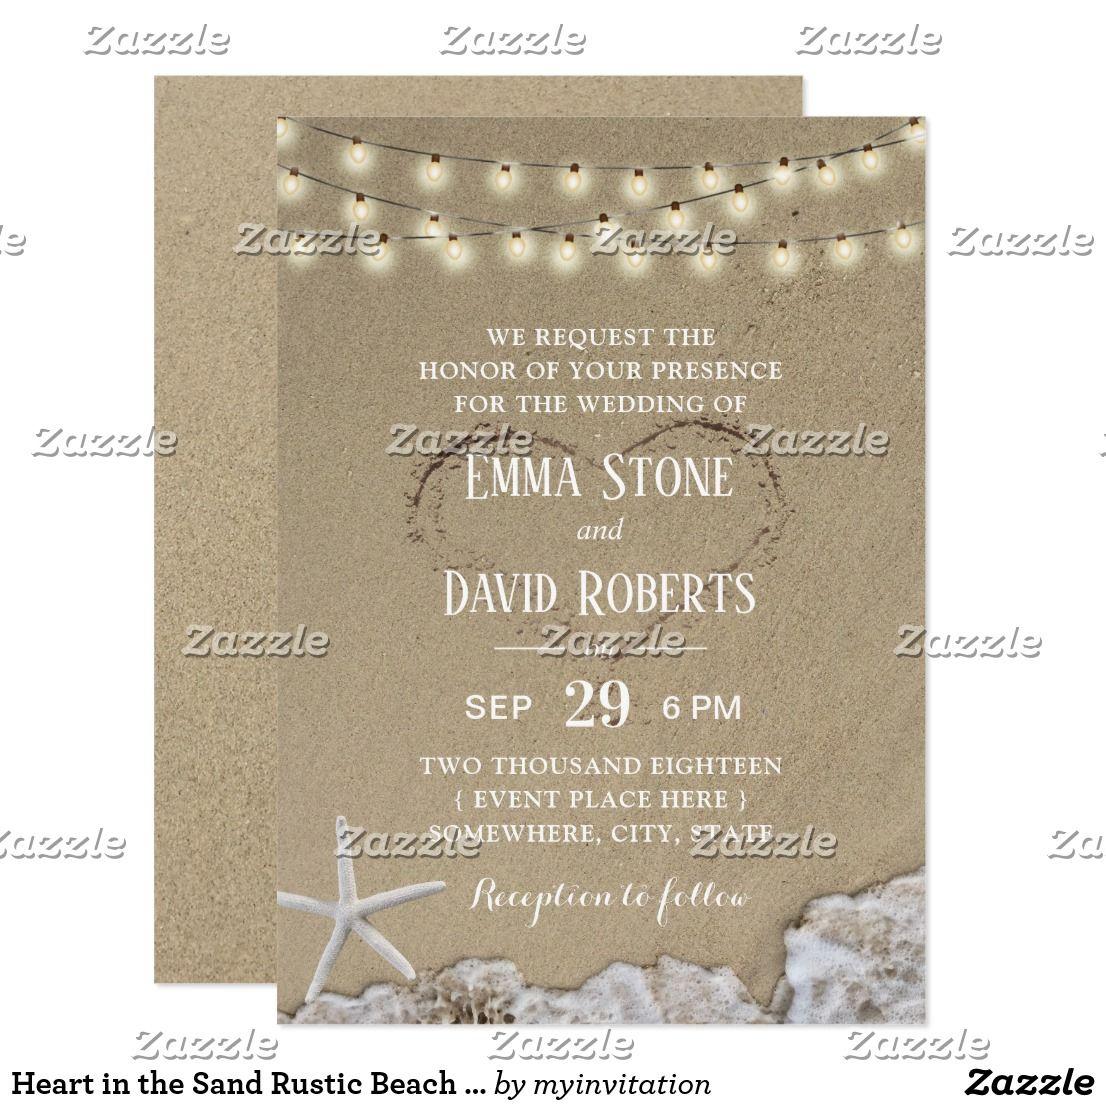 Zazzle Wedding Invitations.Heart In The Sand Rustic Beach Wedding Invitation Zazzle Com In